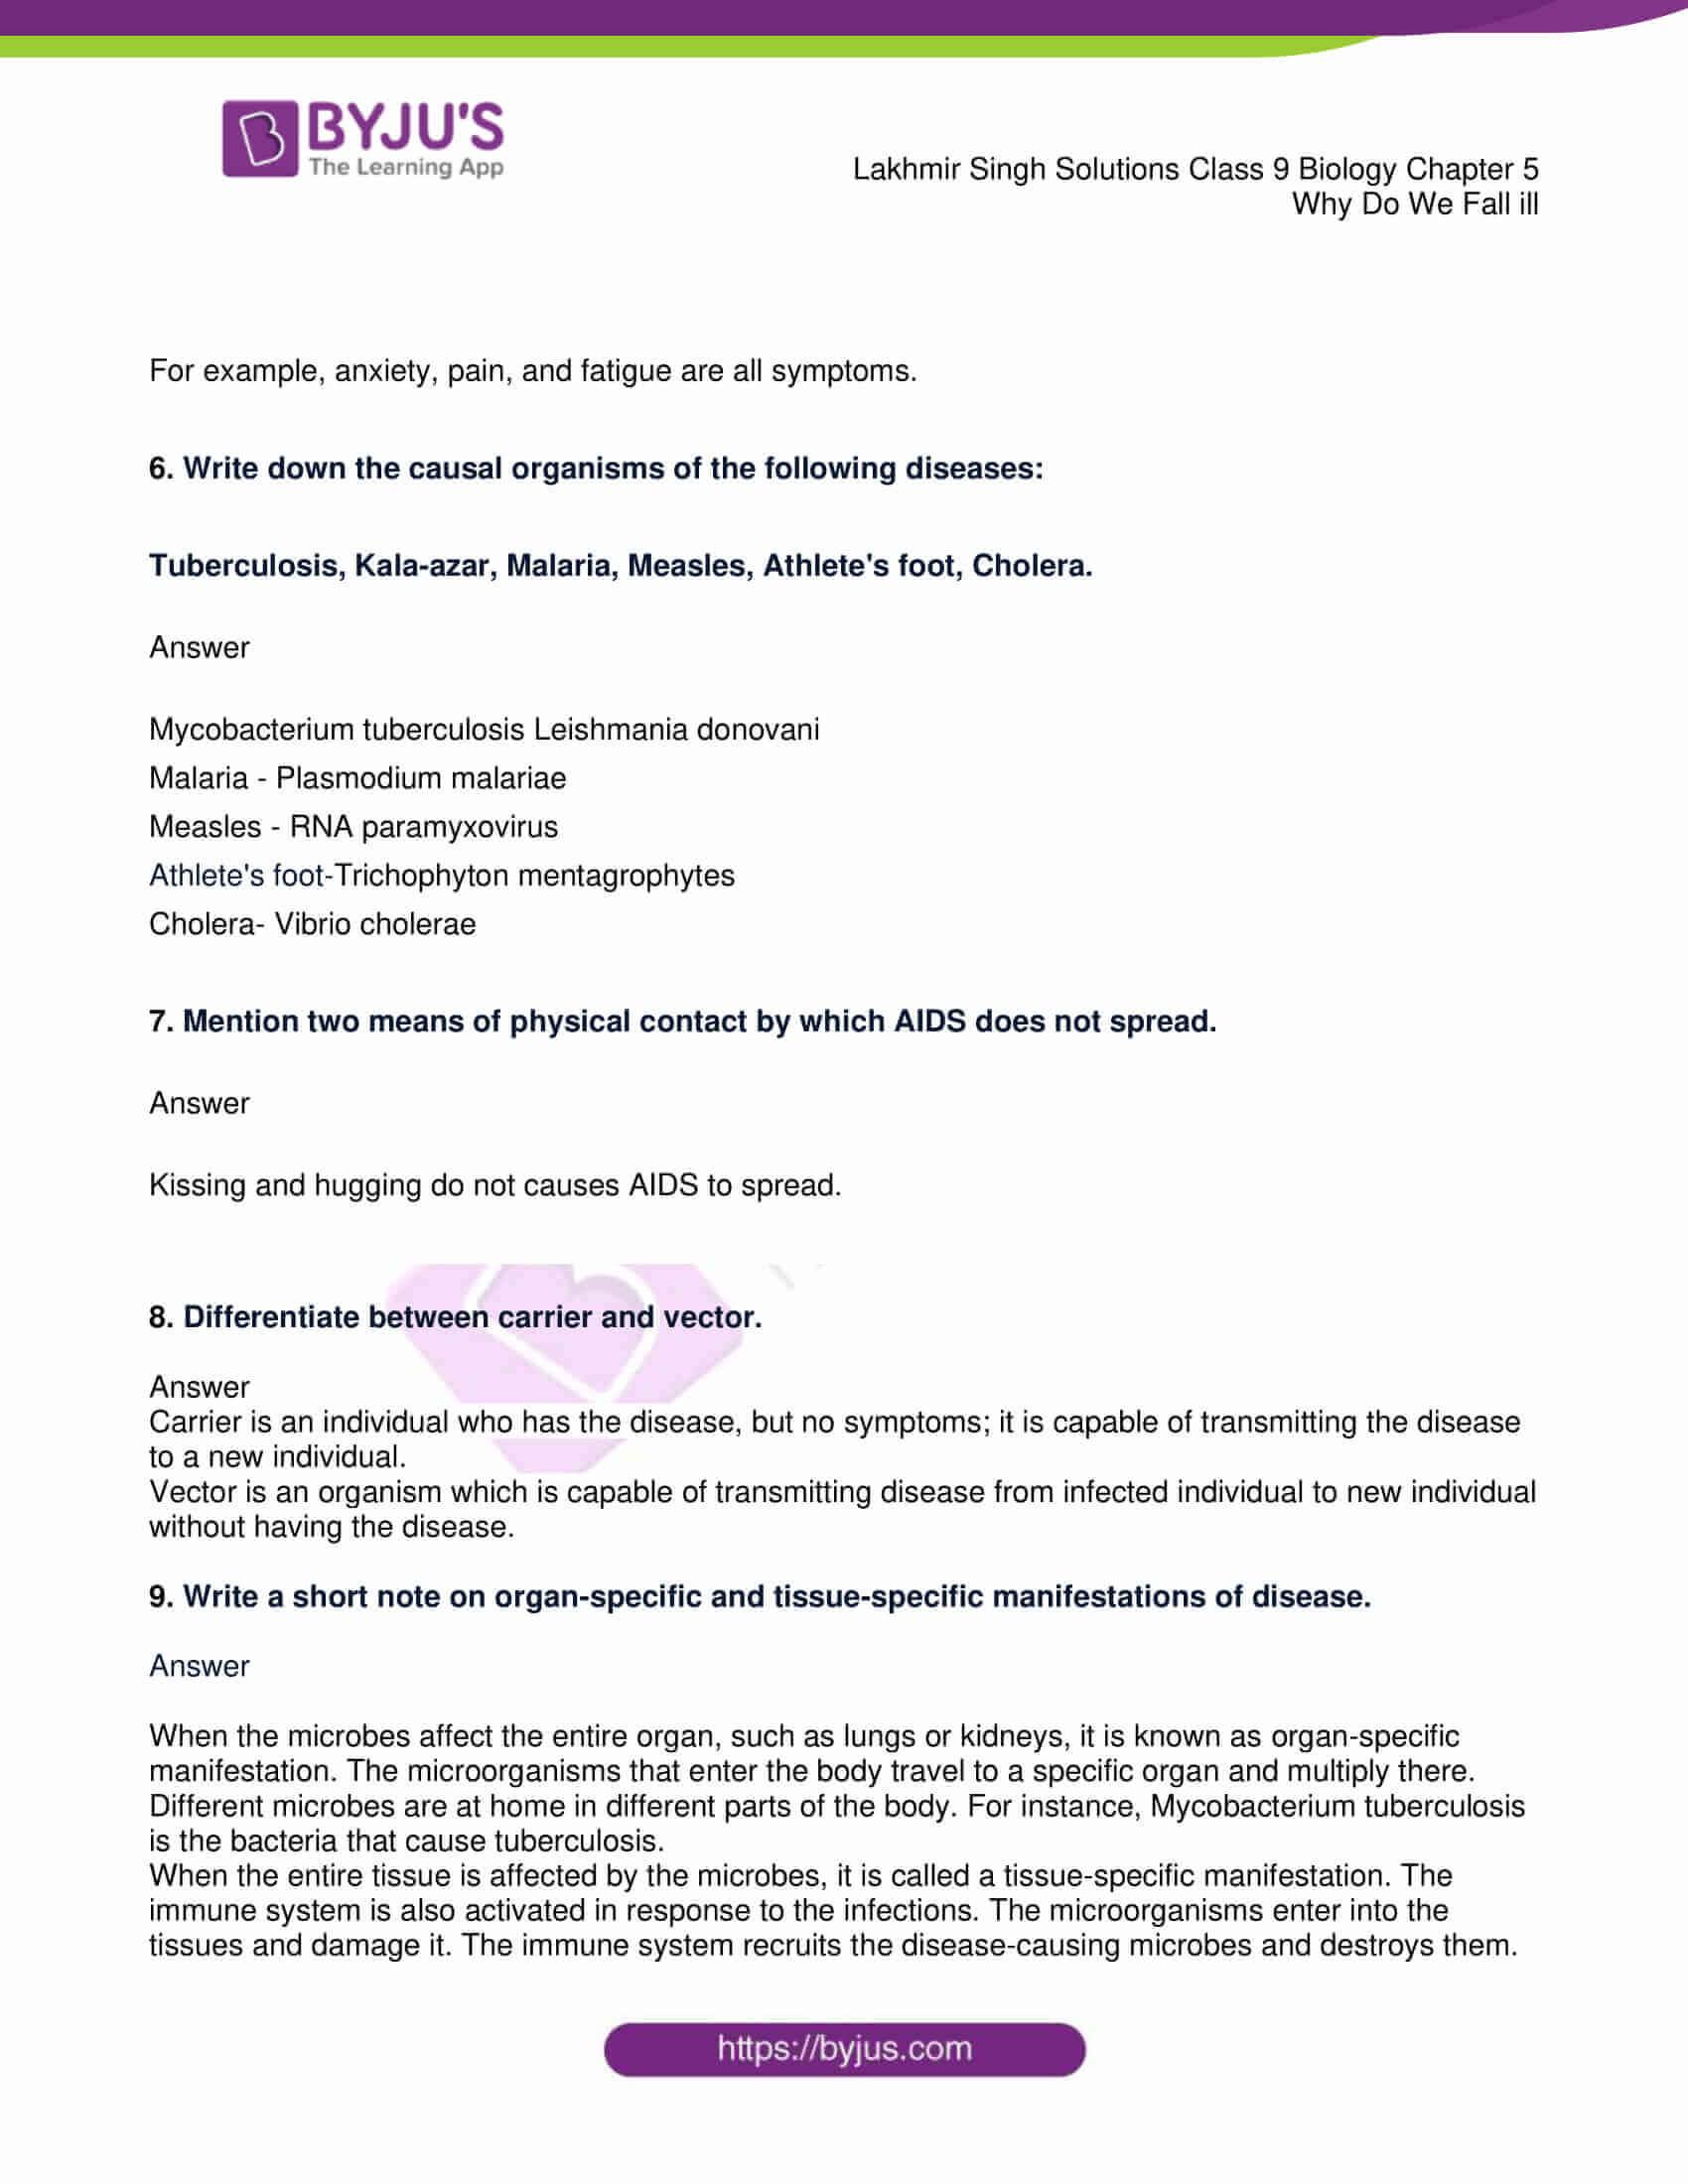 lakhmir singh solutions class 9 biology chapter 5 2